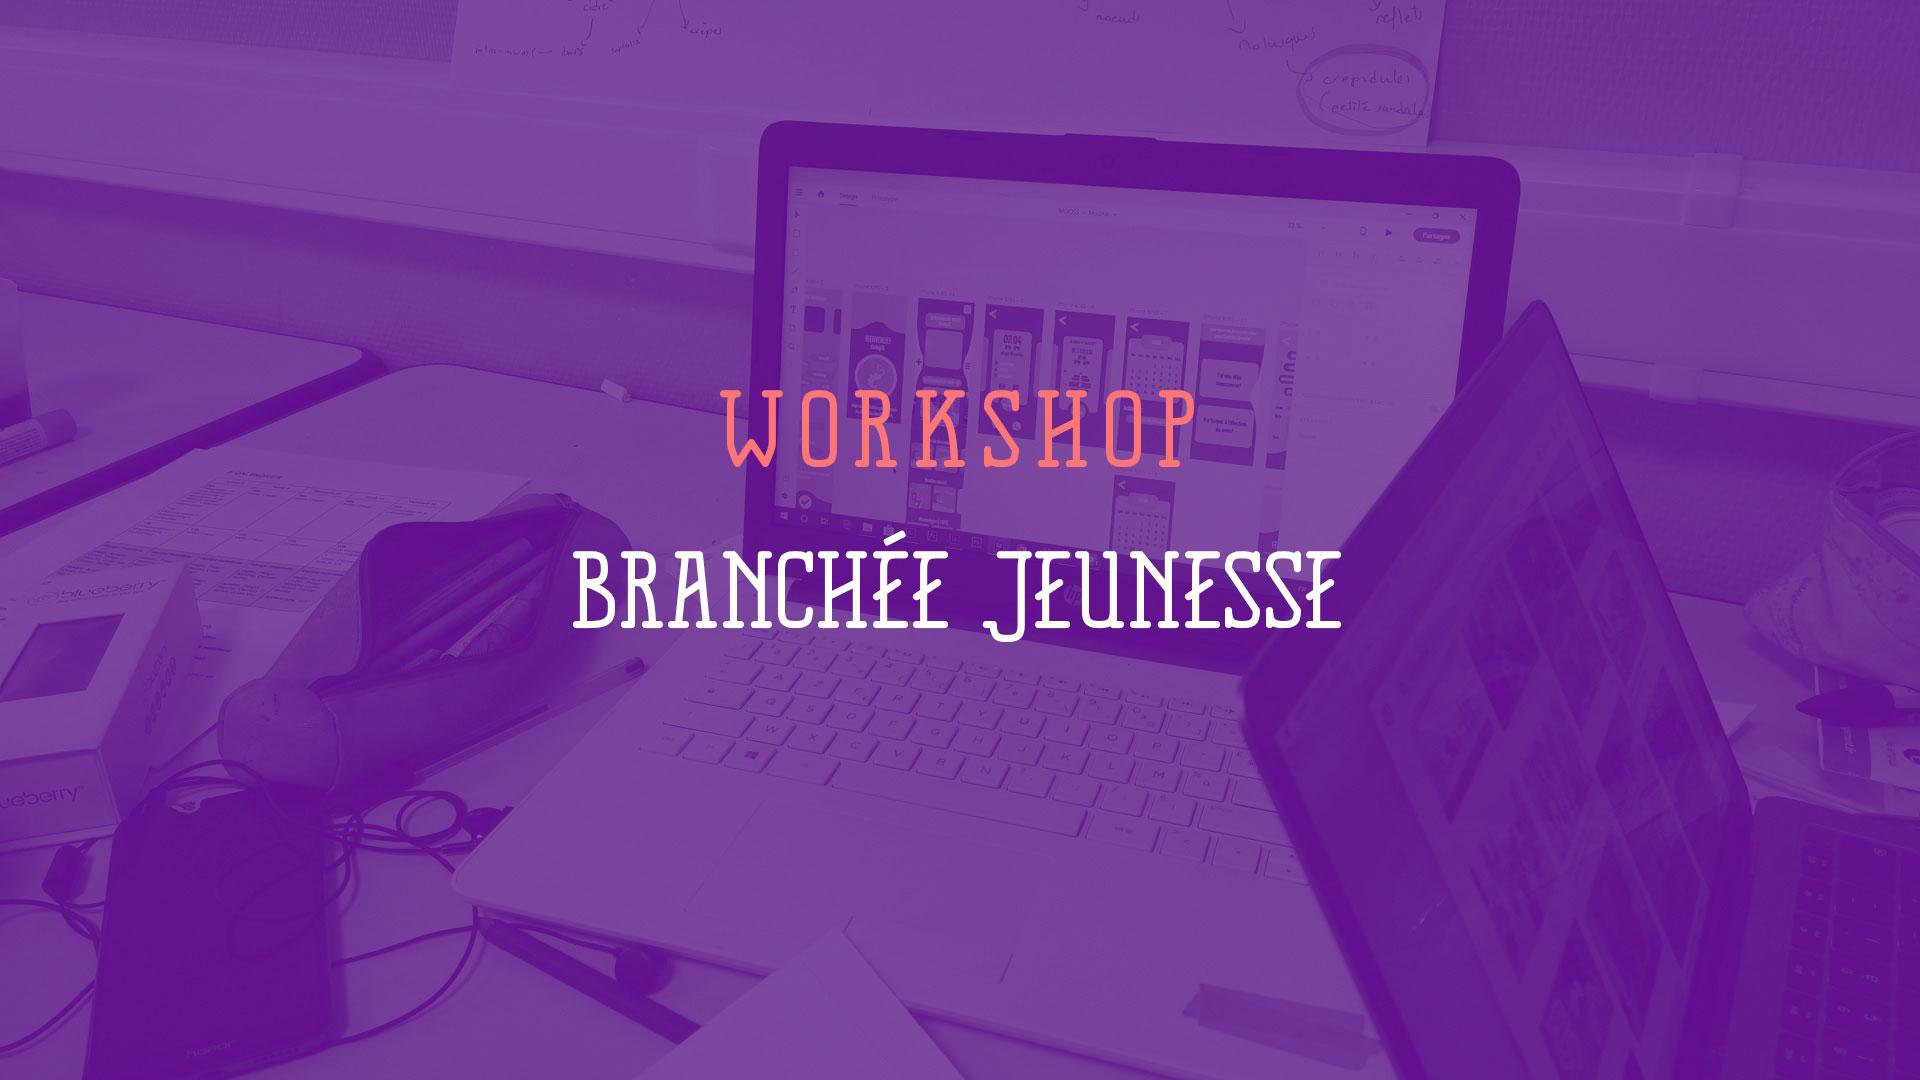 Branchée jeunesse workshop